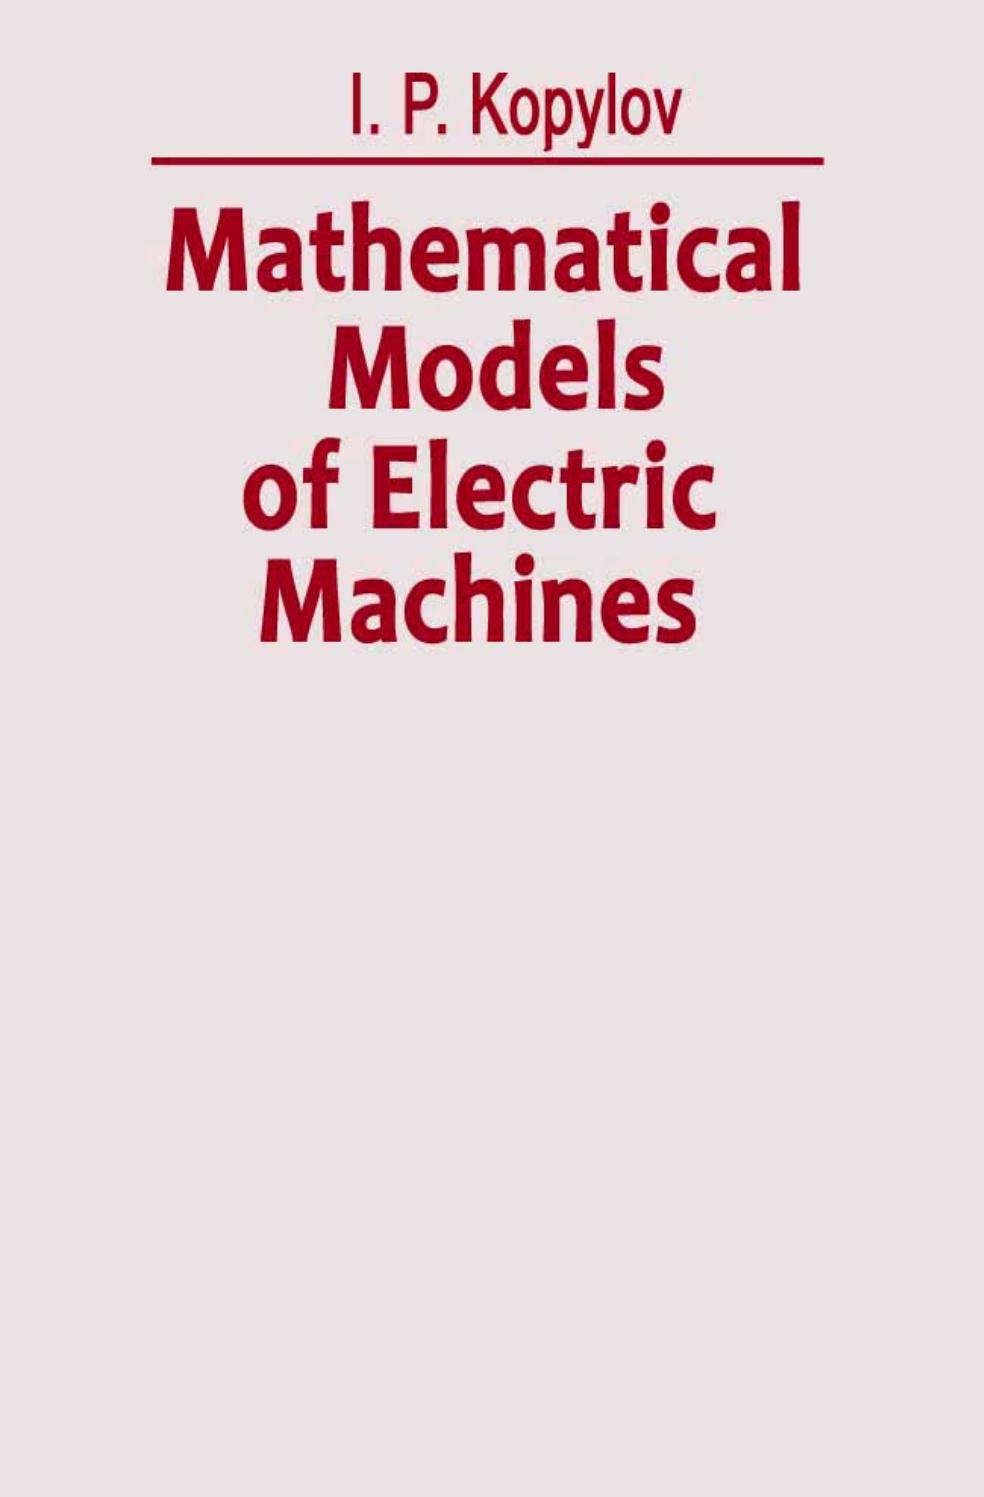 Ana Mhv Porno mathematical models of electric machines - i. p. kopylov